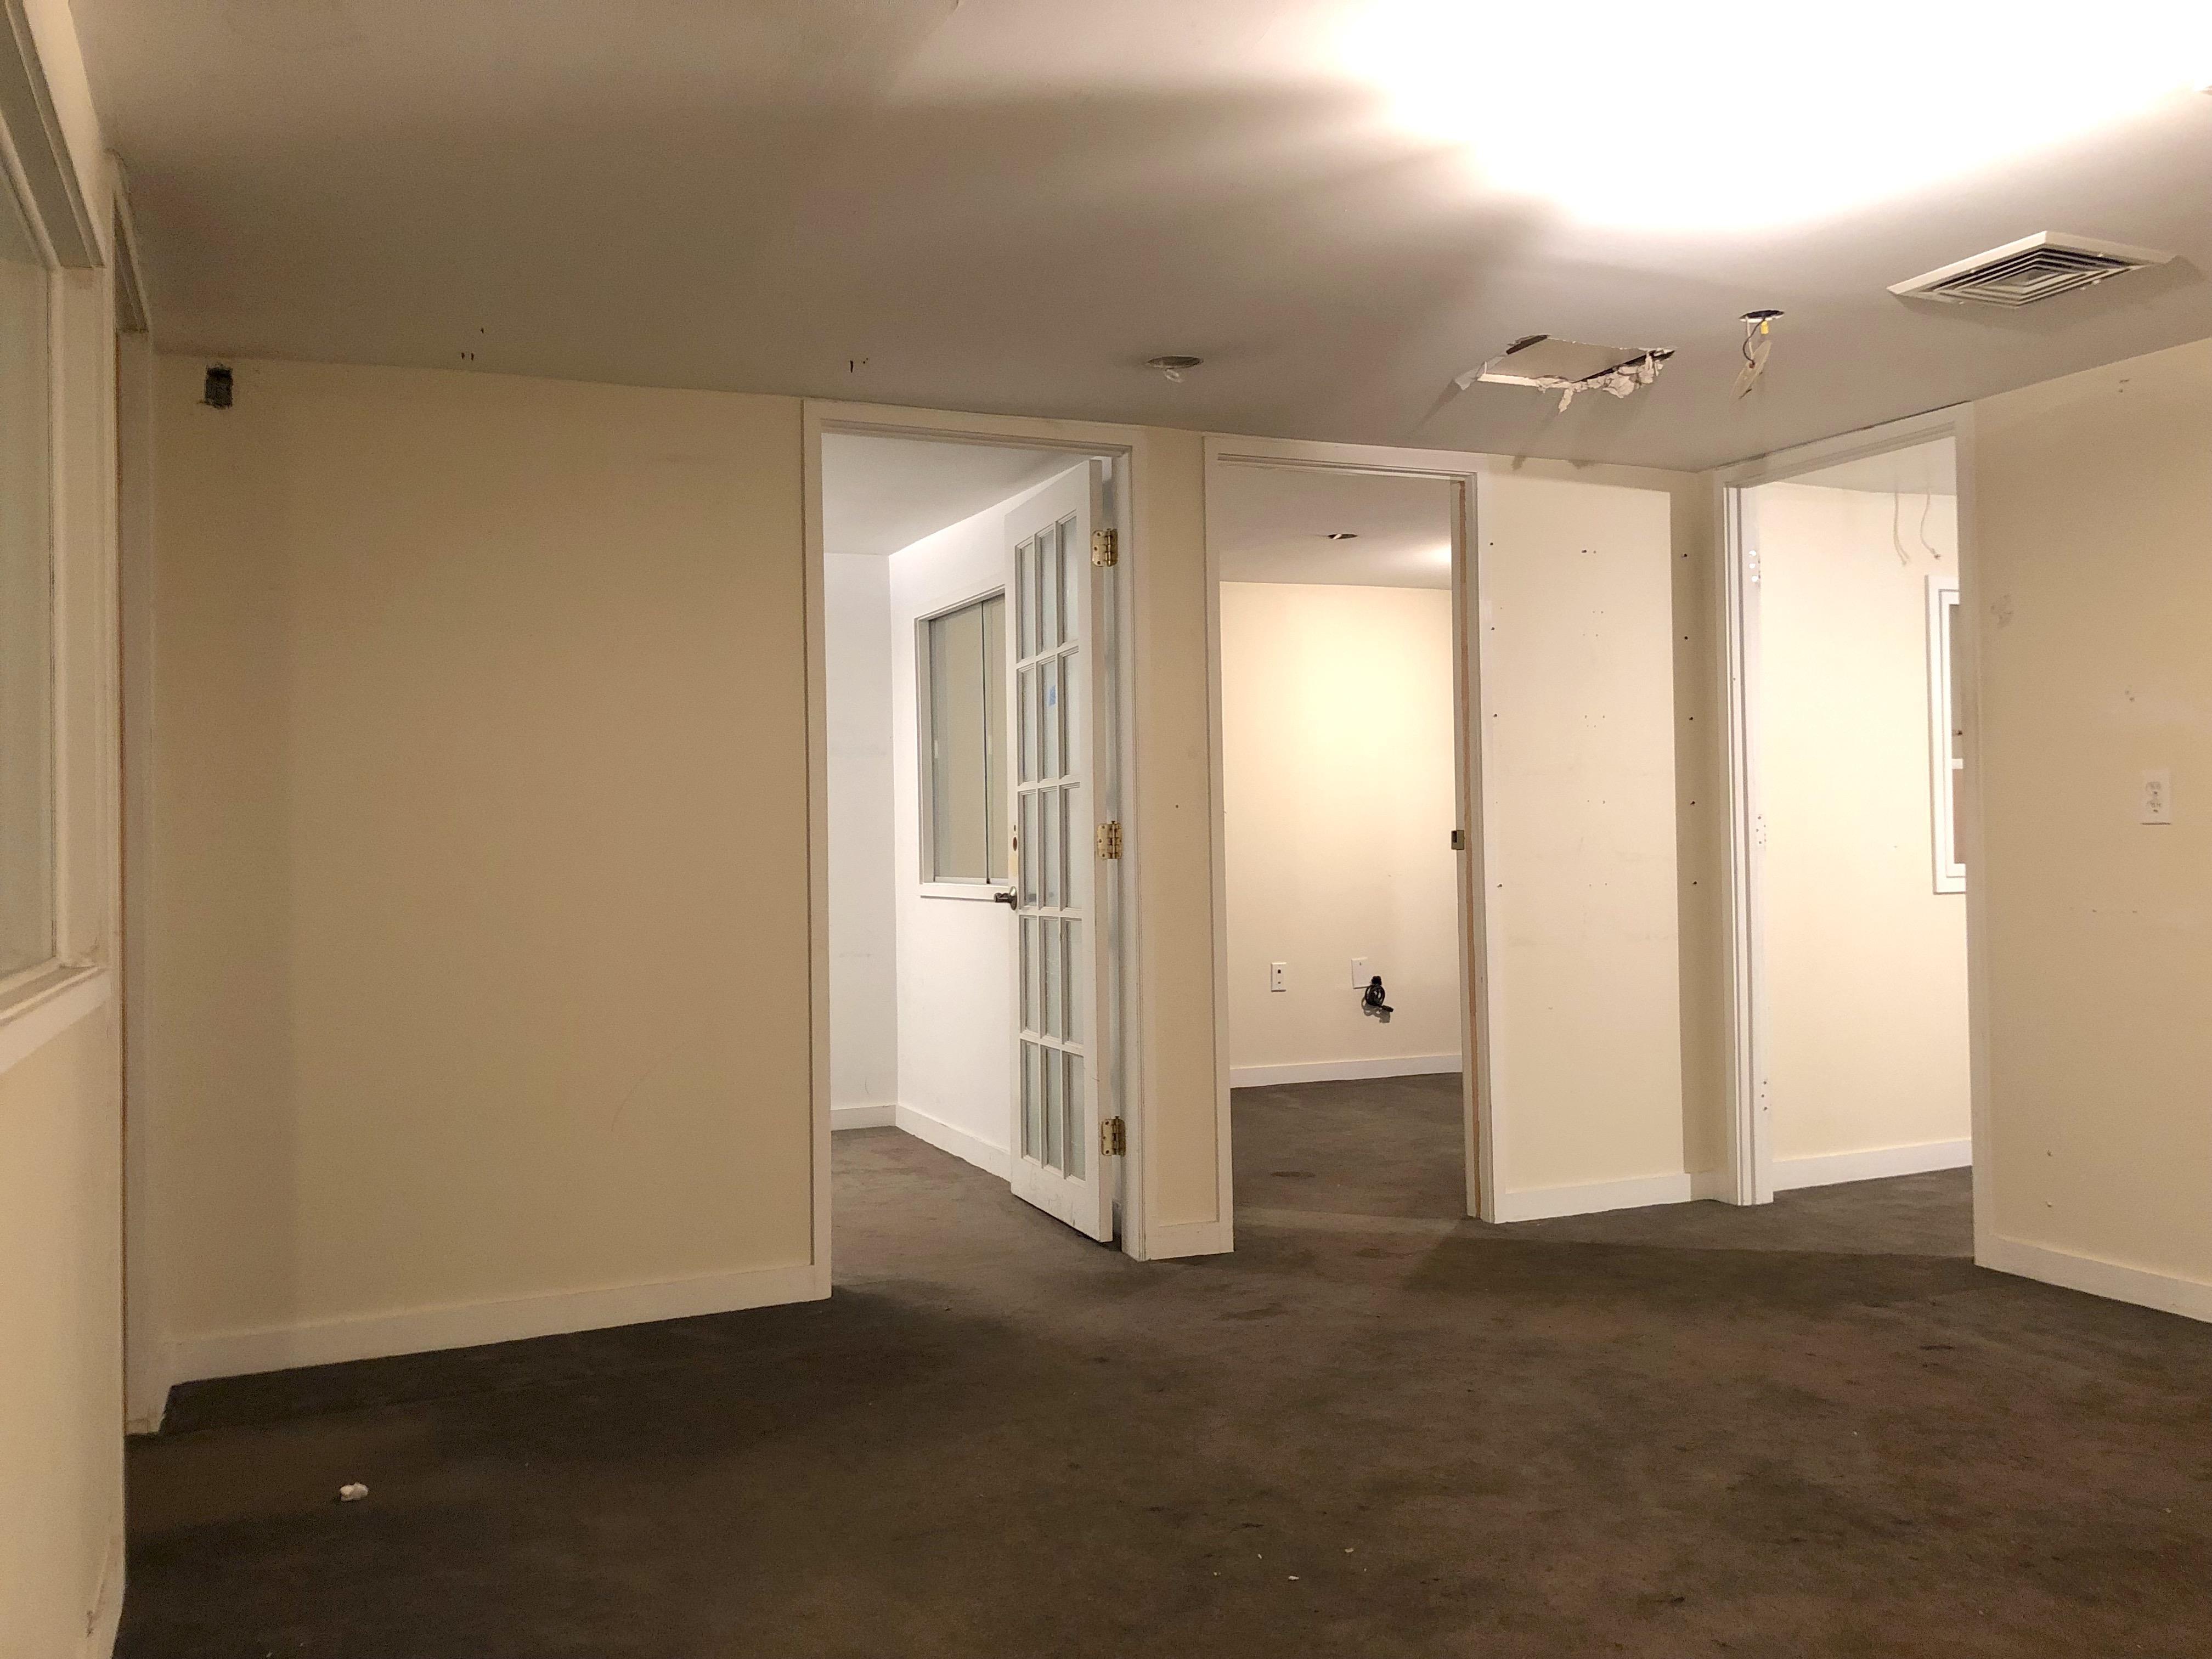 Jet Real Estate - Office Suite 1